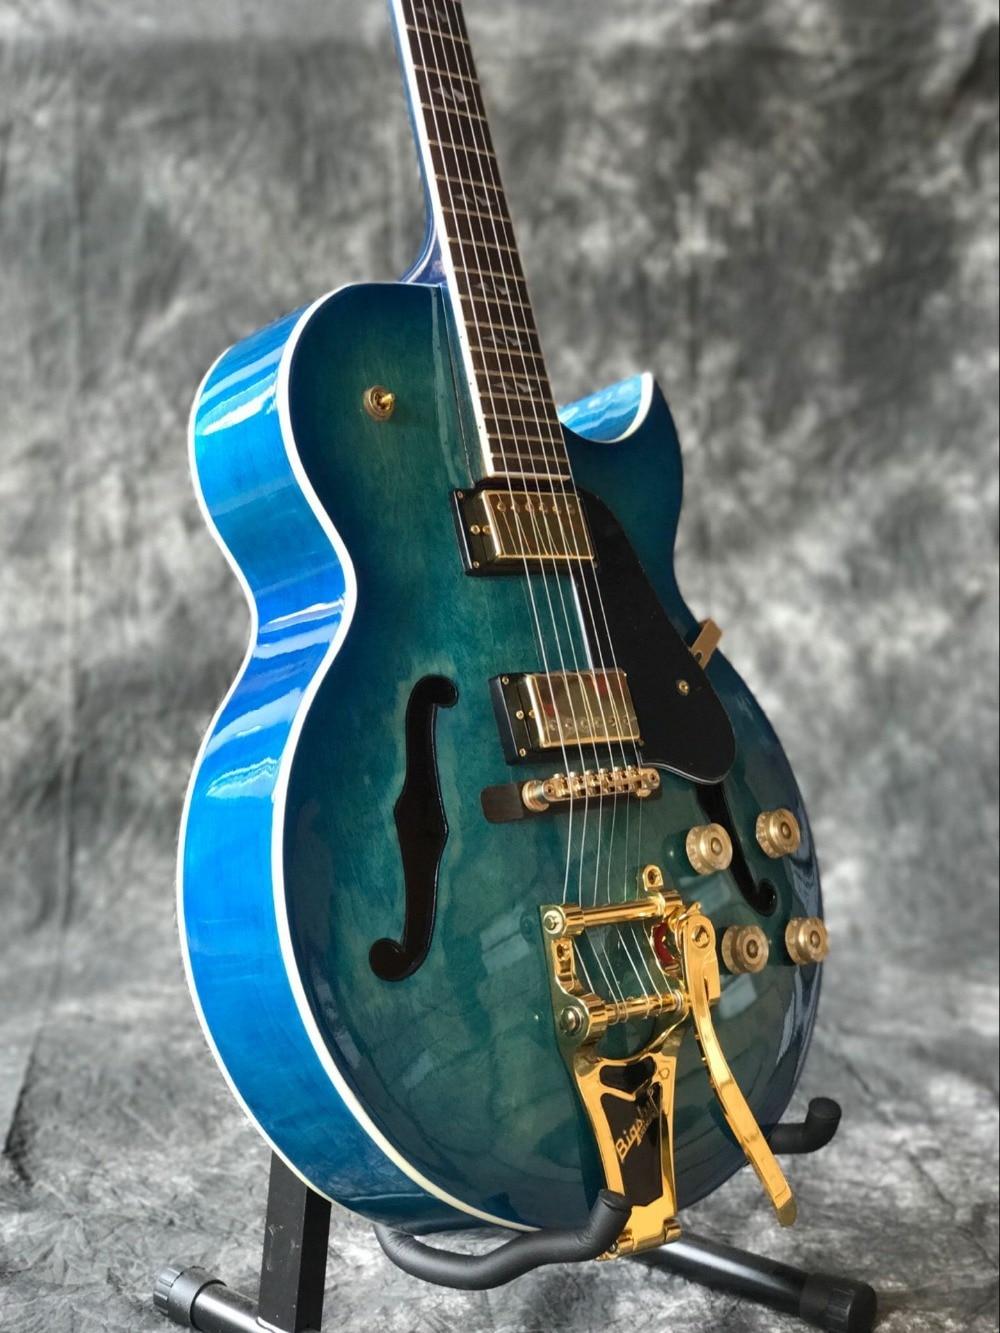 New standard custom 60 F hollow body jazz Electric Guitar.blue gitaar,musical instrument guitarra,black pickguard.vibrato system